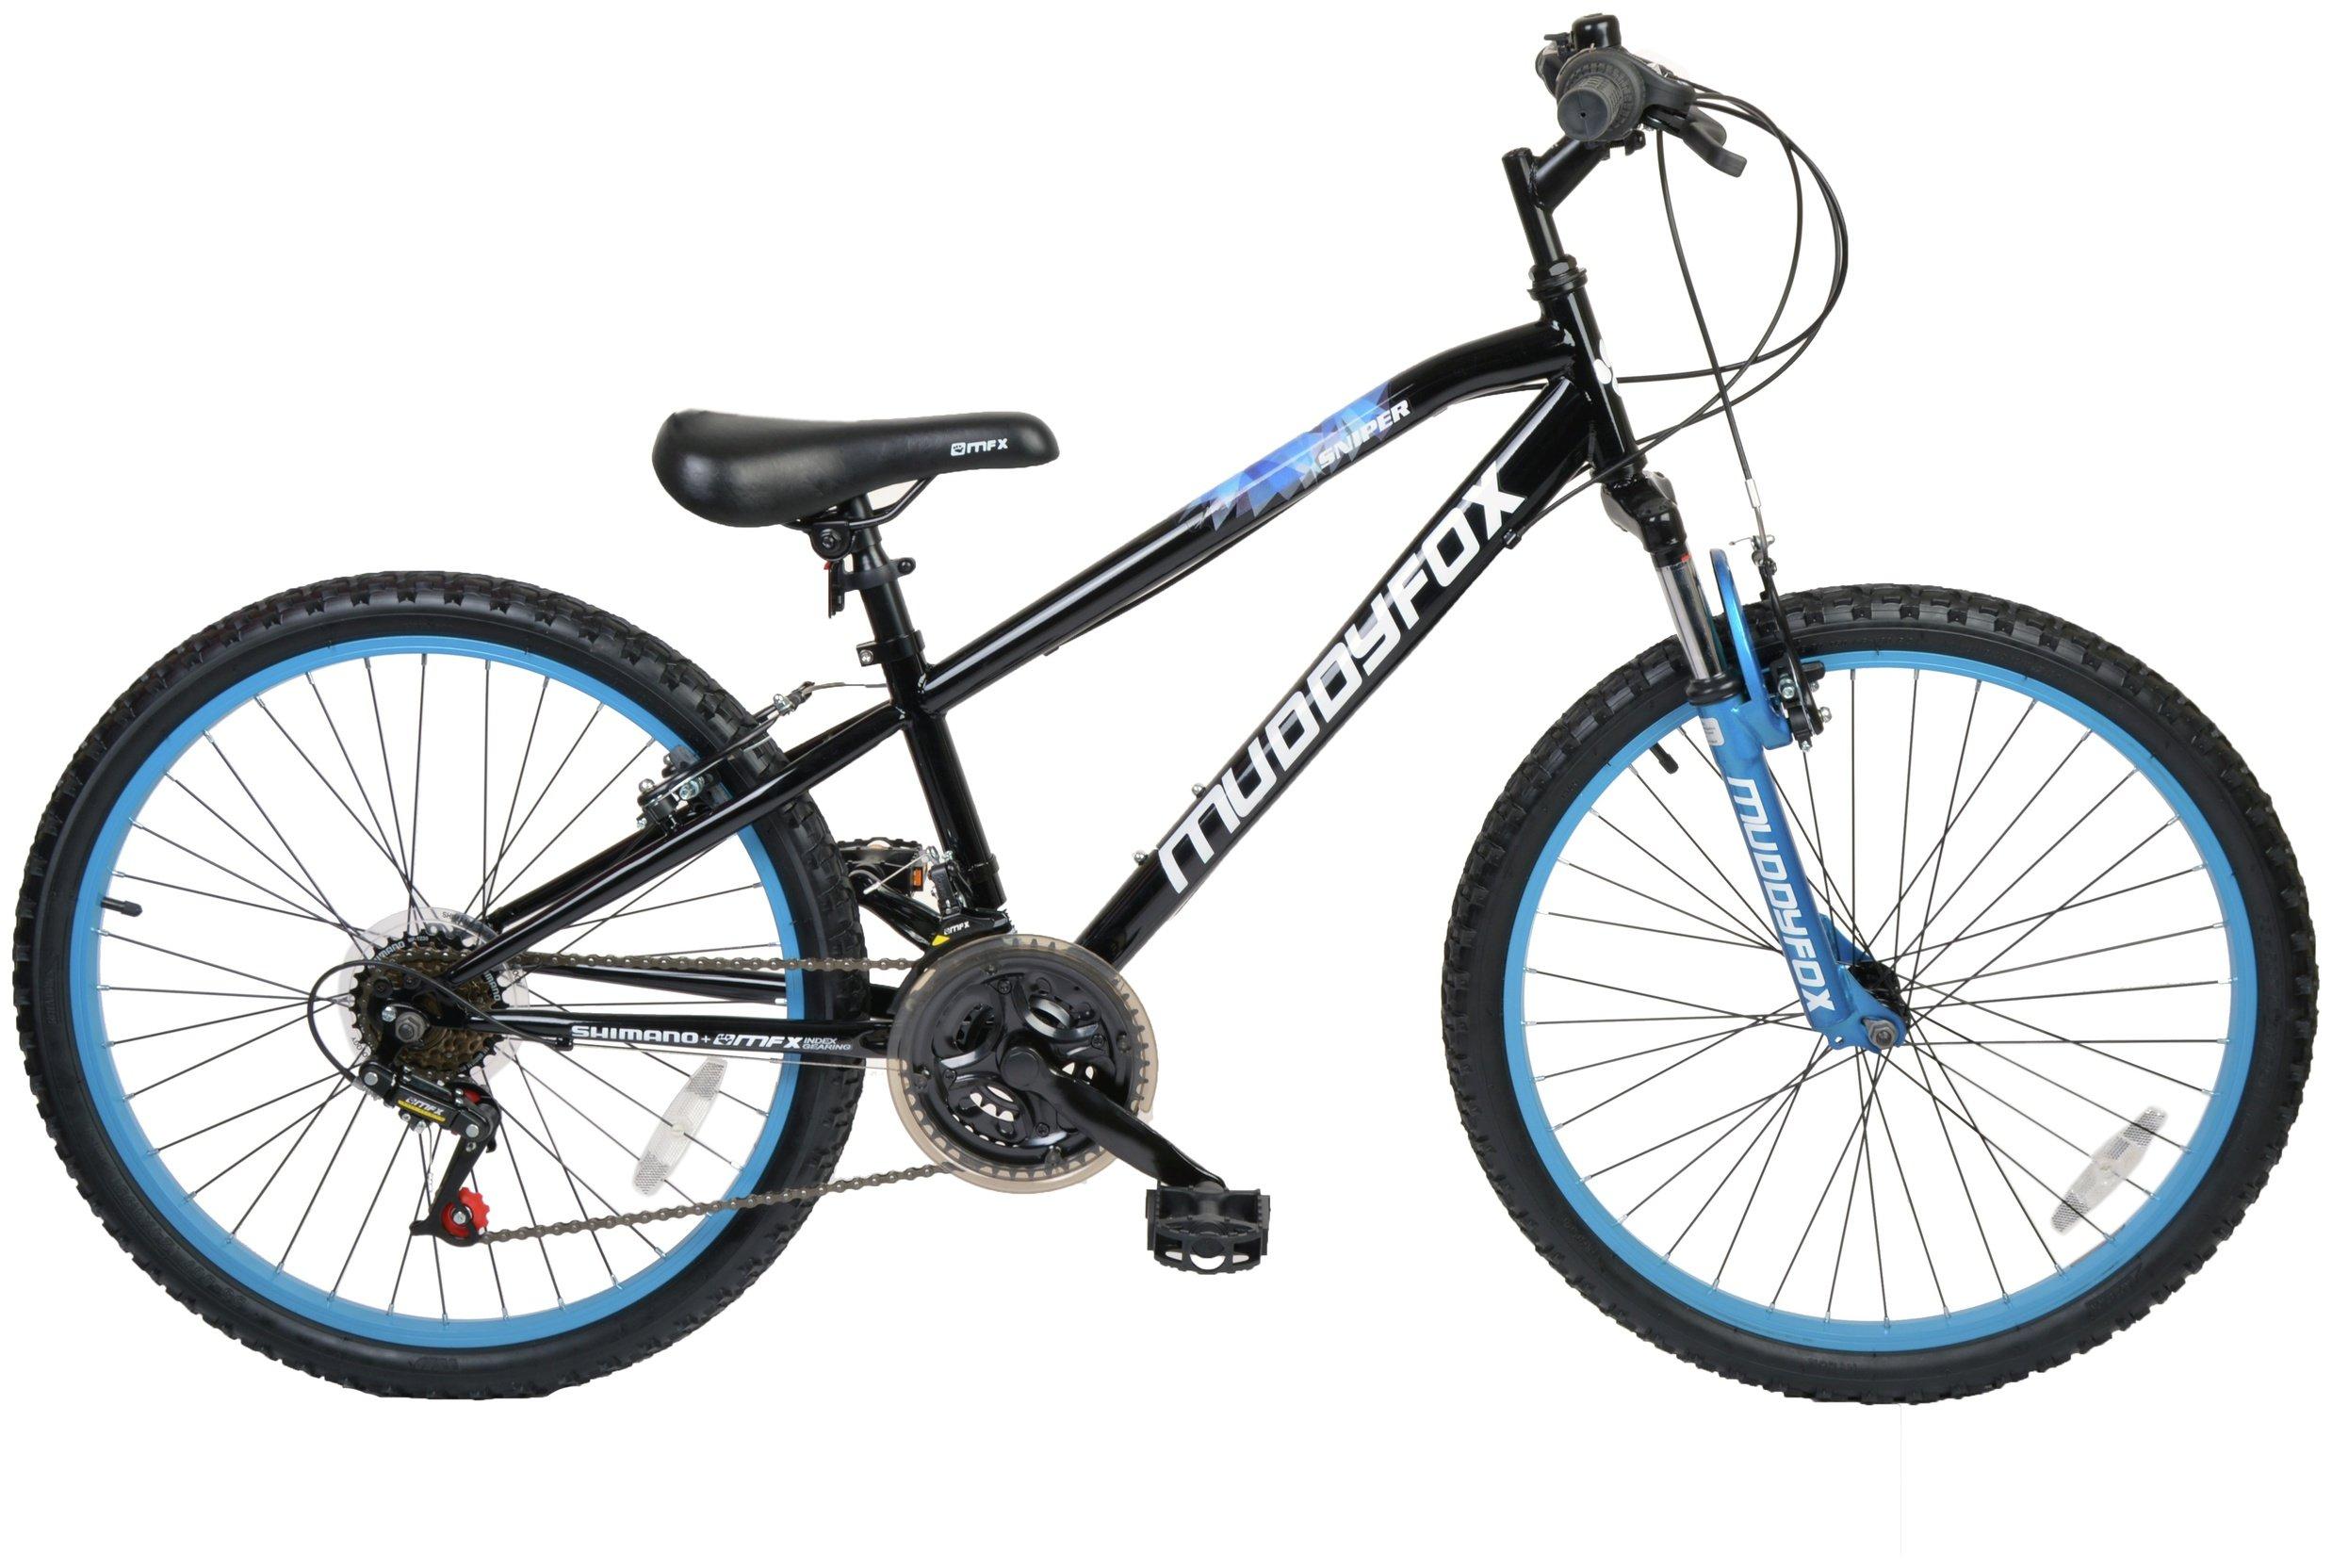 Muddyfox Sniper 24 Inch Boys Bike review